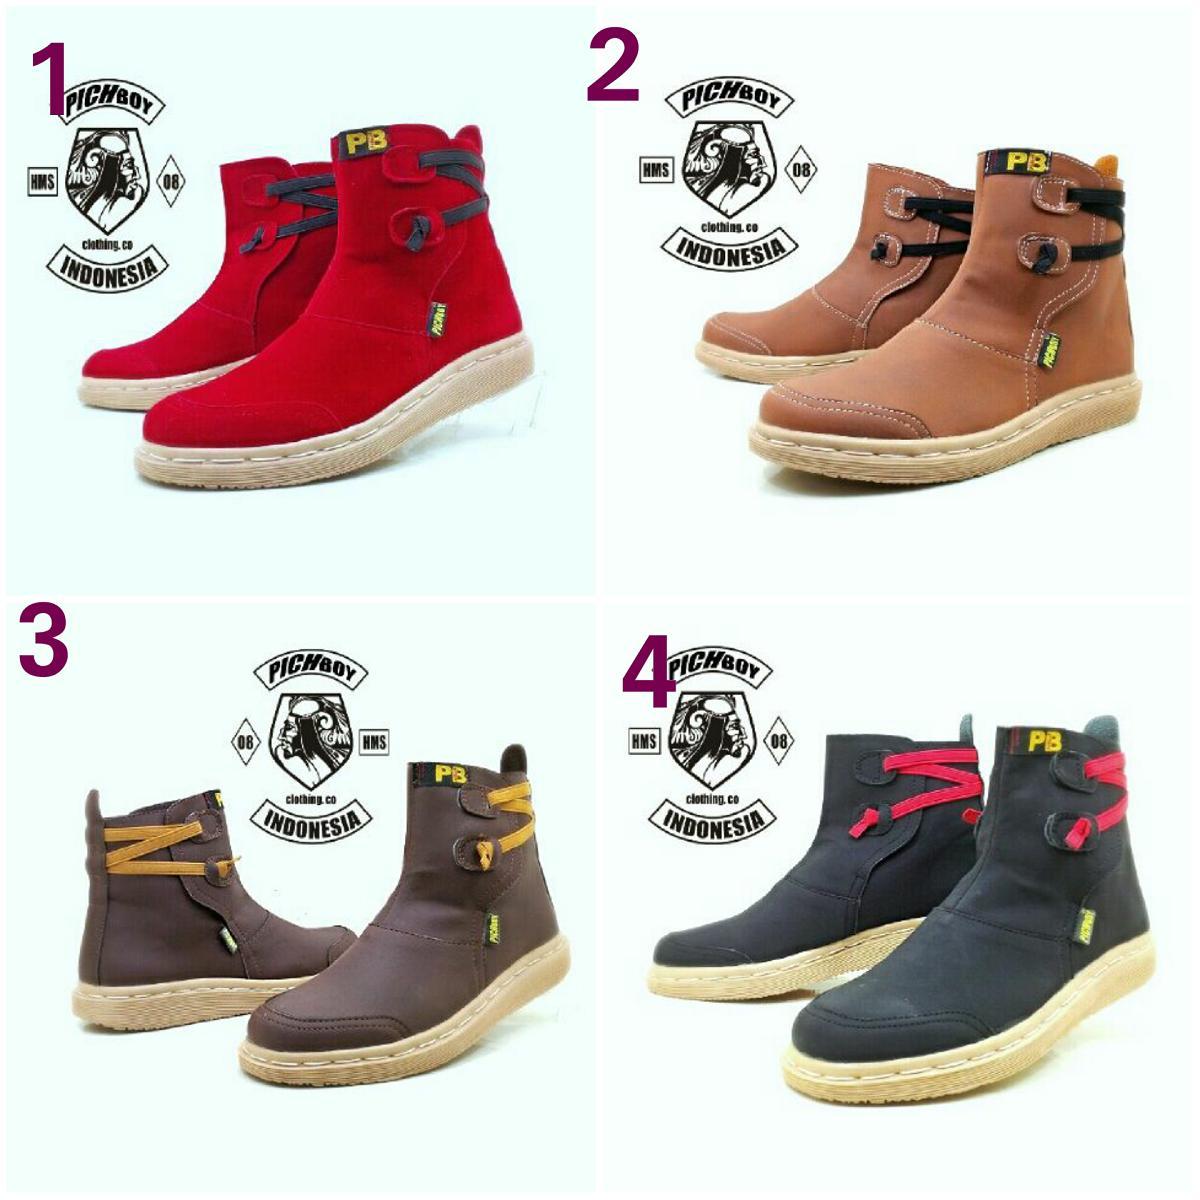 Sepatu Boots Woman Pichboy Original Boots Sepatu Boots Wanita #02